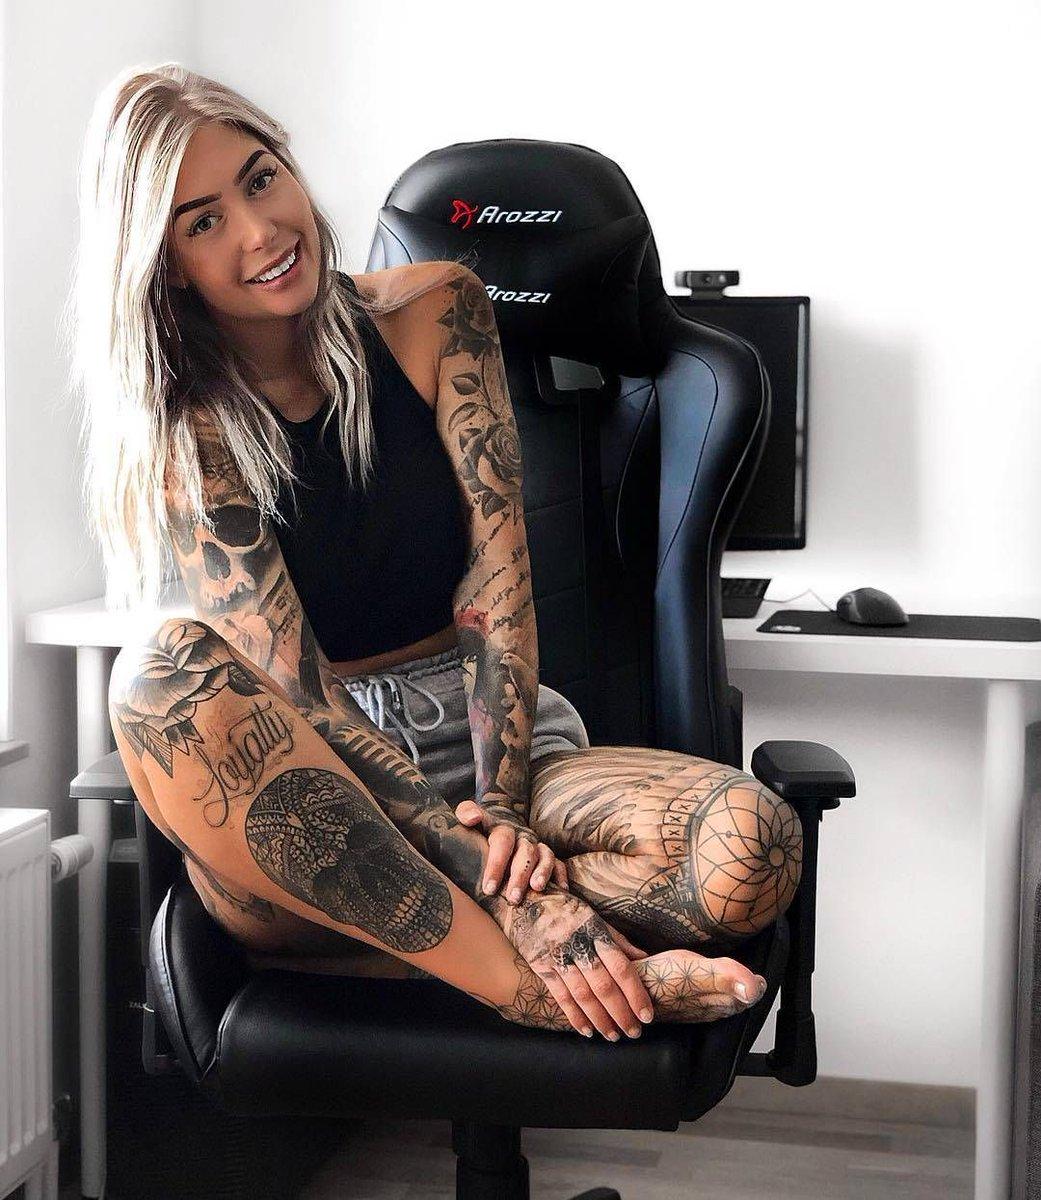 LIKE, COMMENT & RATE her #ink 1-10 ❤️❤️❤️❤️❤️❤️❤️❤️  #tattoomodelsscandinavia  #tat #instatattoo #tattooed #inks #sleevetattoo #instagood #cute #tattoist #tflers #tattoo #bodyart #love #coverup #inked #instaart #amazingink #tatts #norge #sverige #nordicgirls #danmark #dkmedier